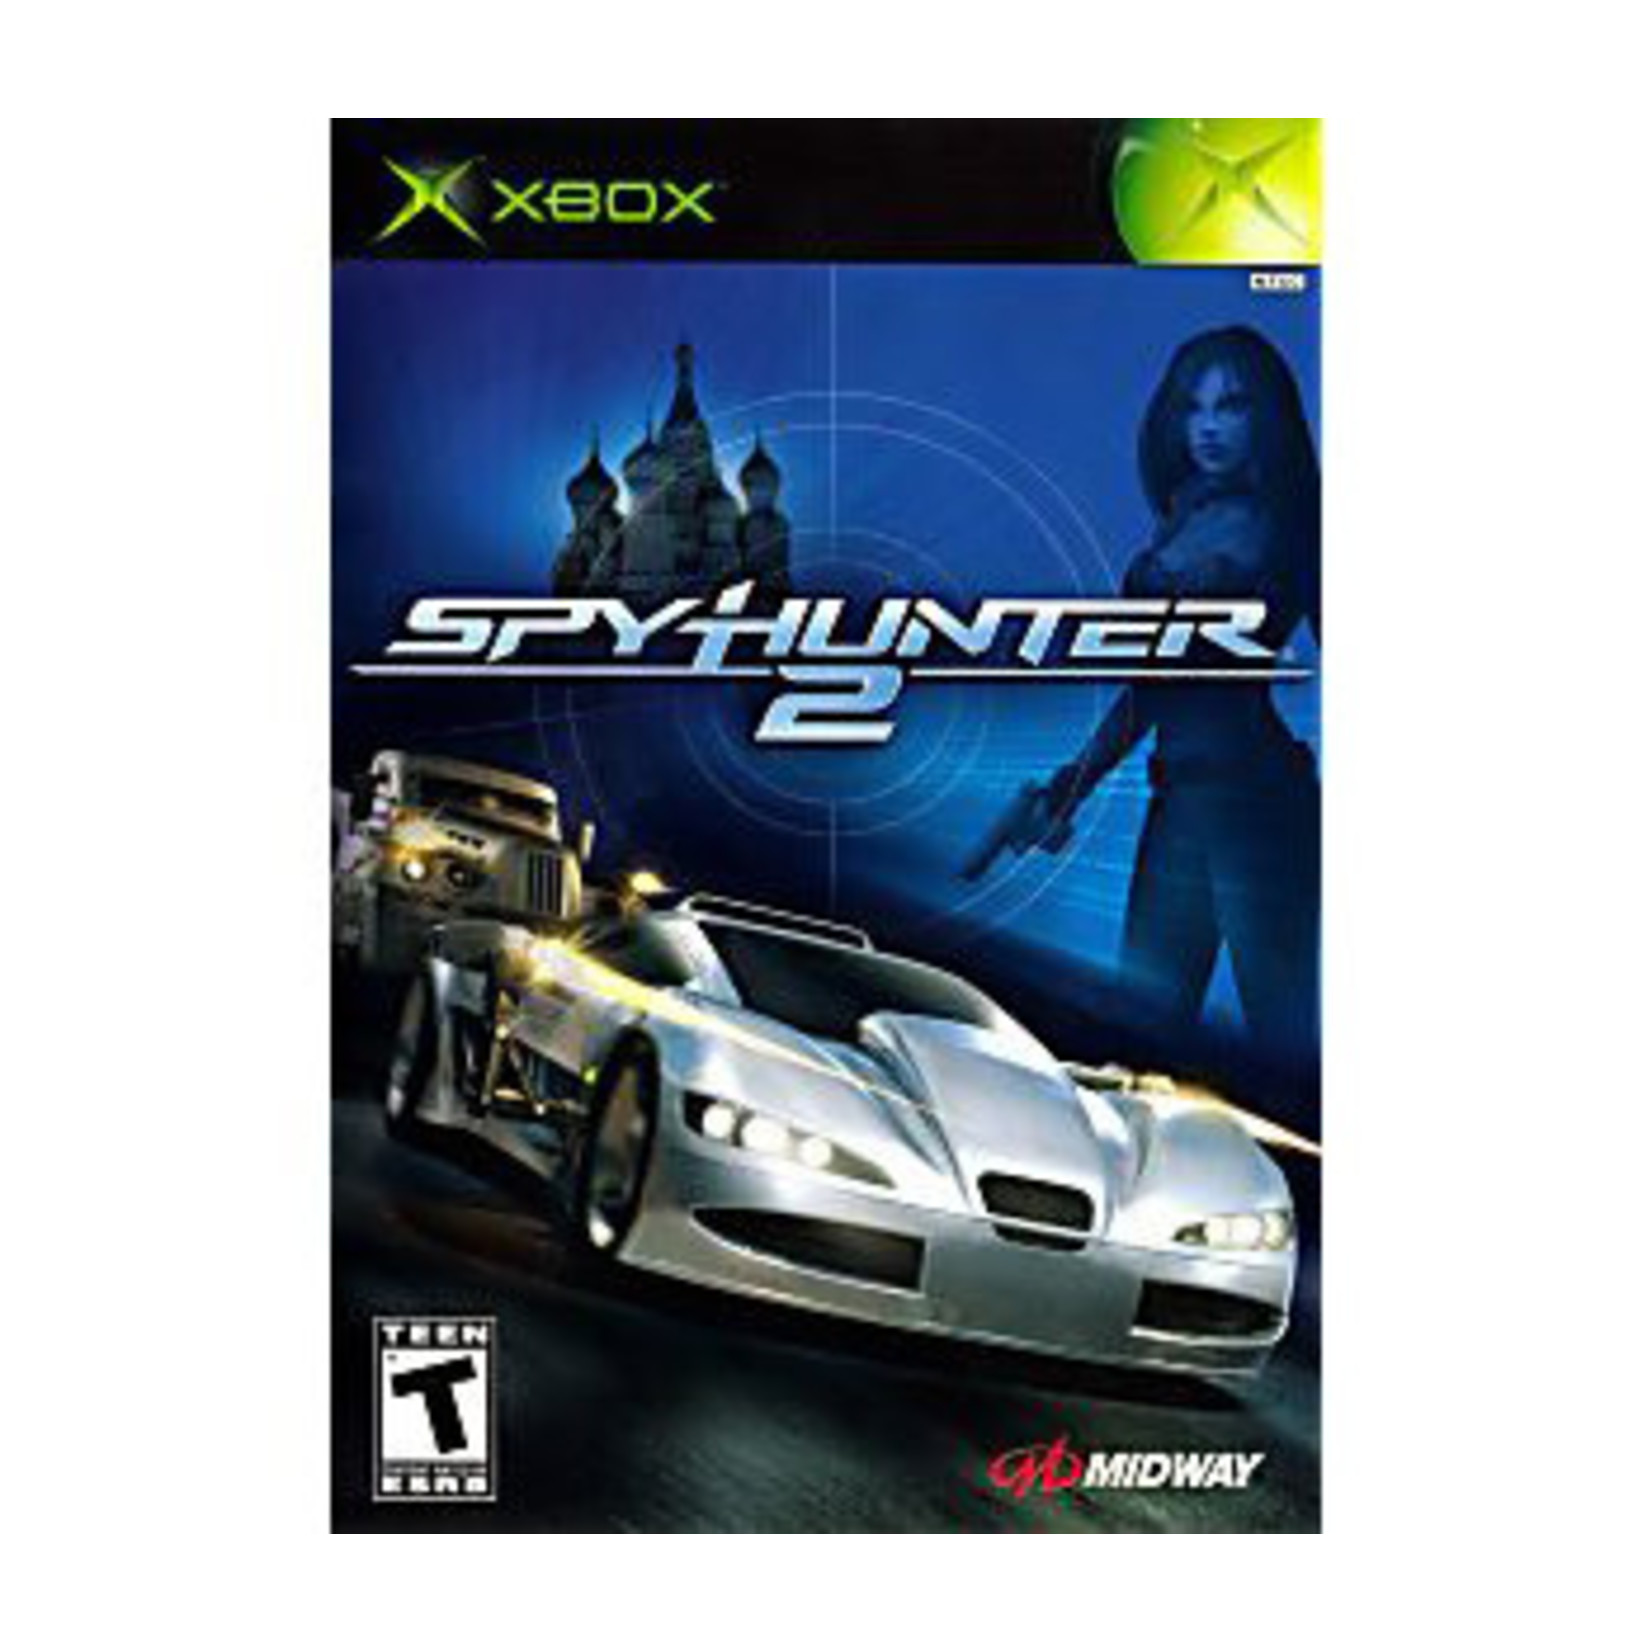 XBU-SPYHUNTER 2